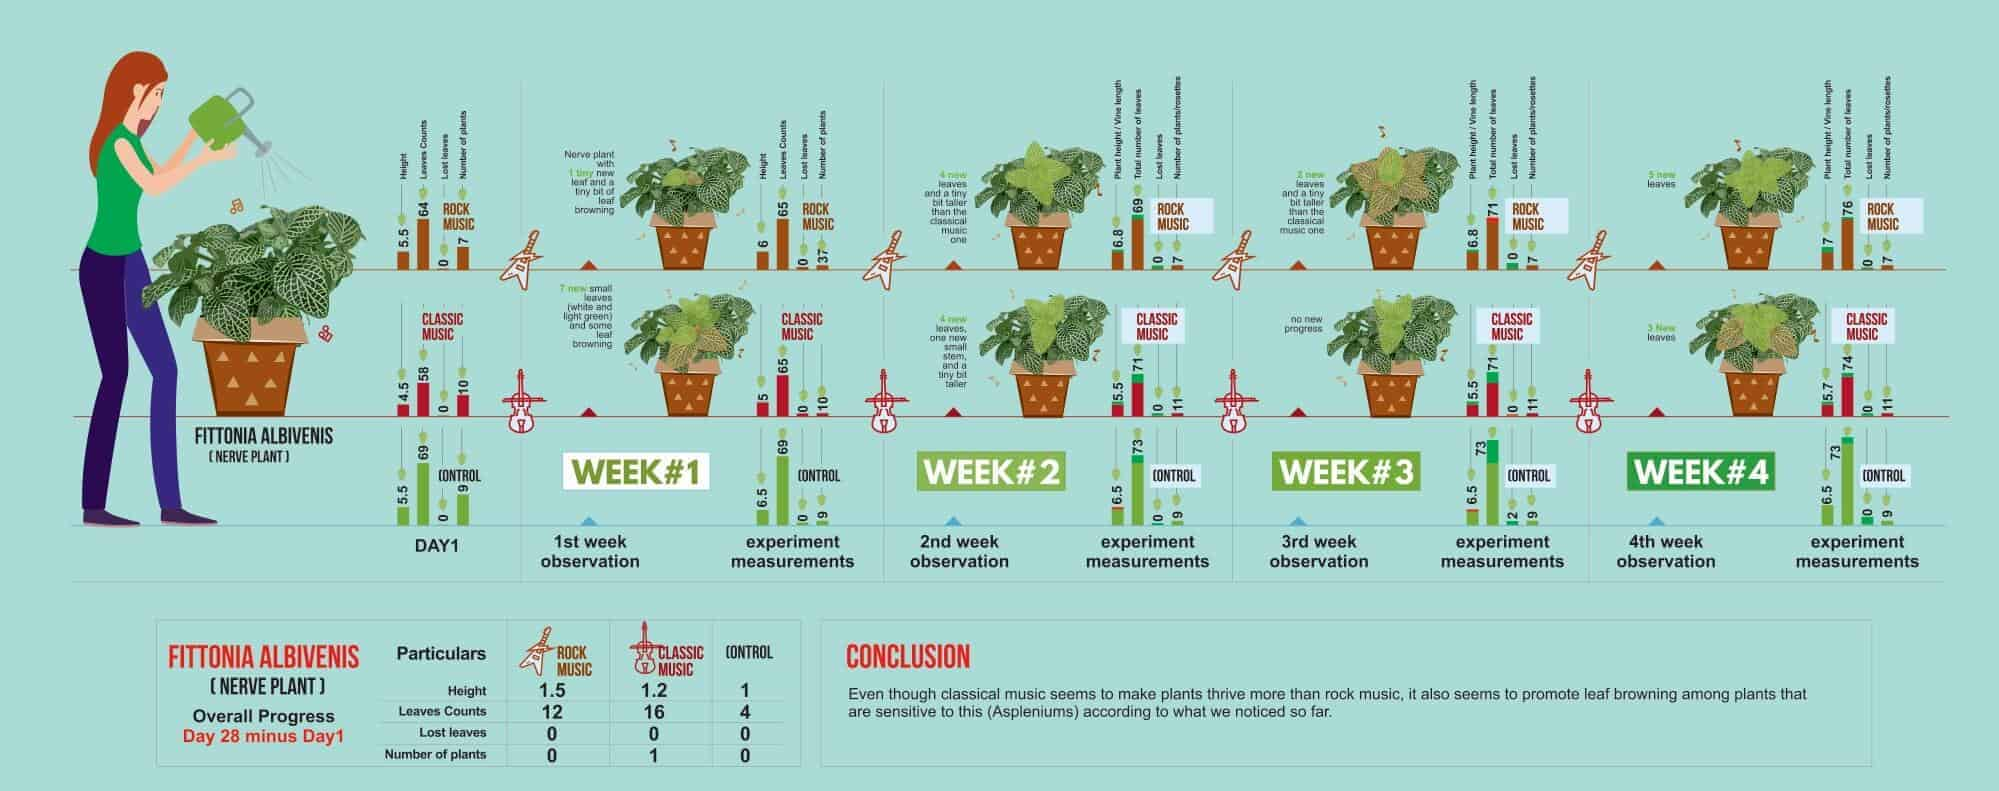 Music for plants experiment - Fittonia Albivenis